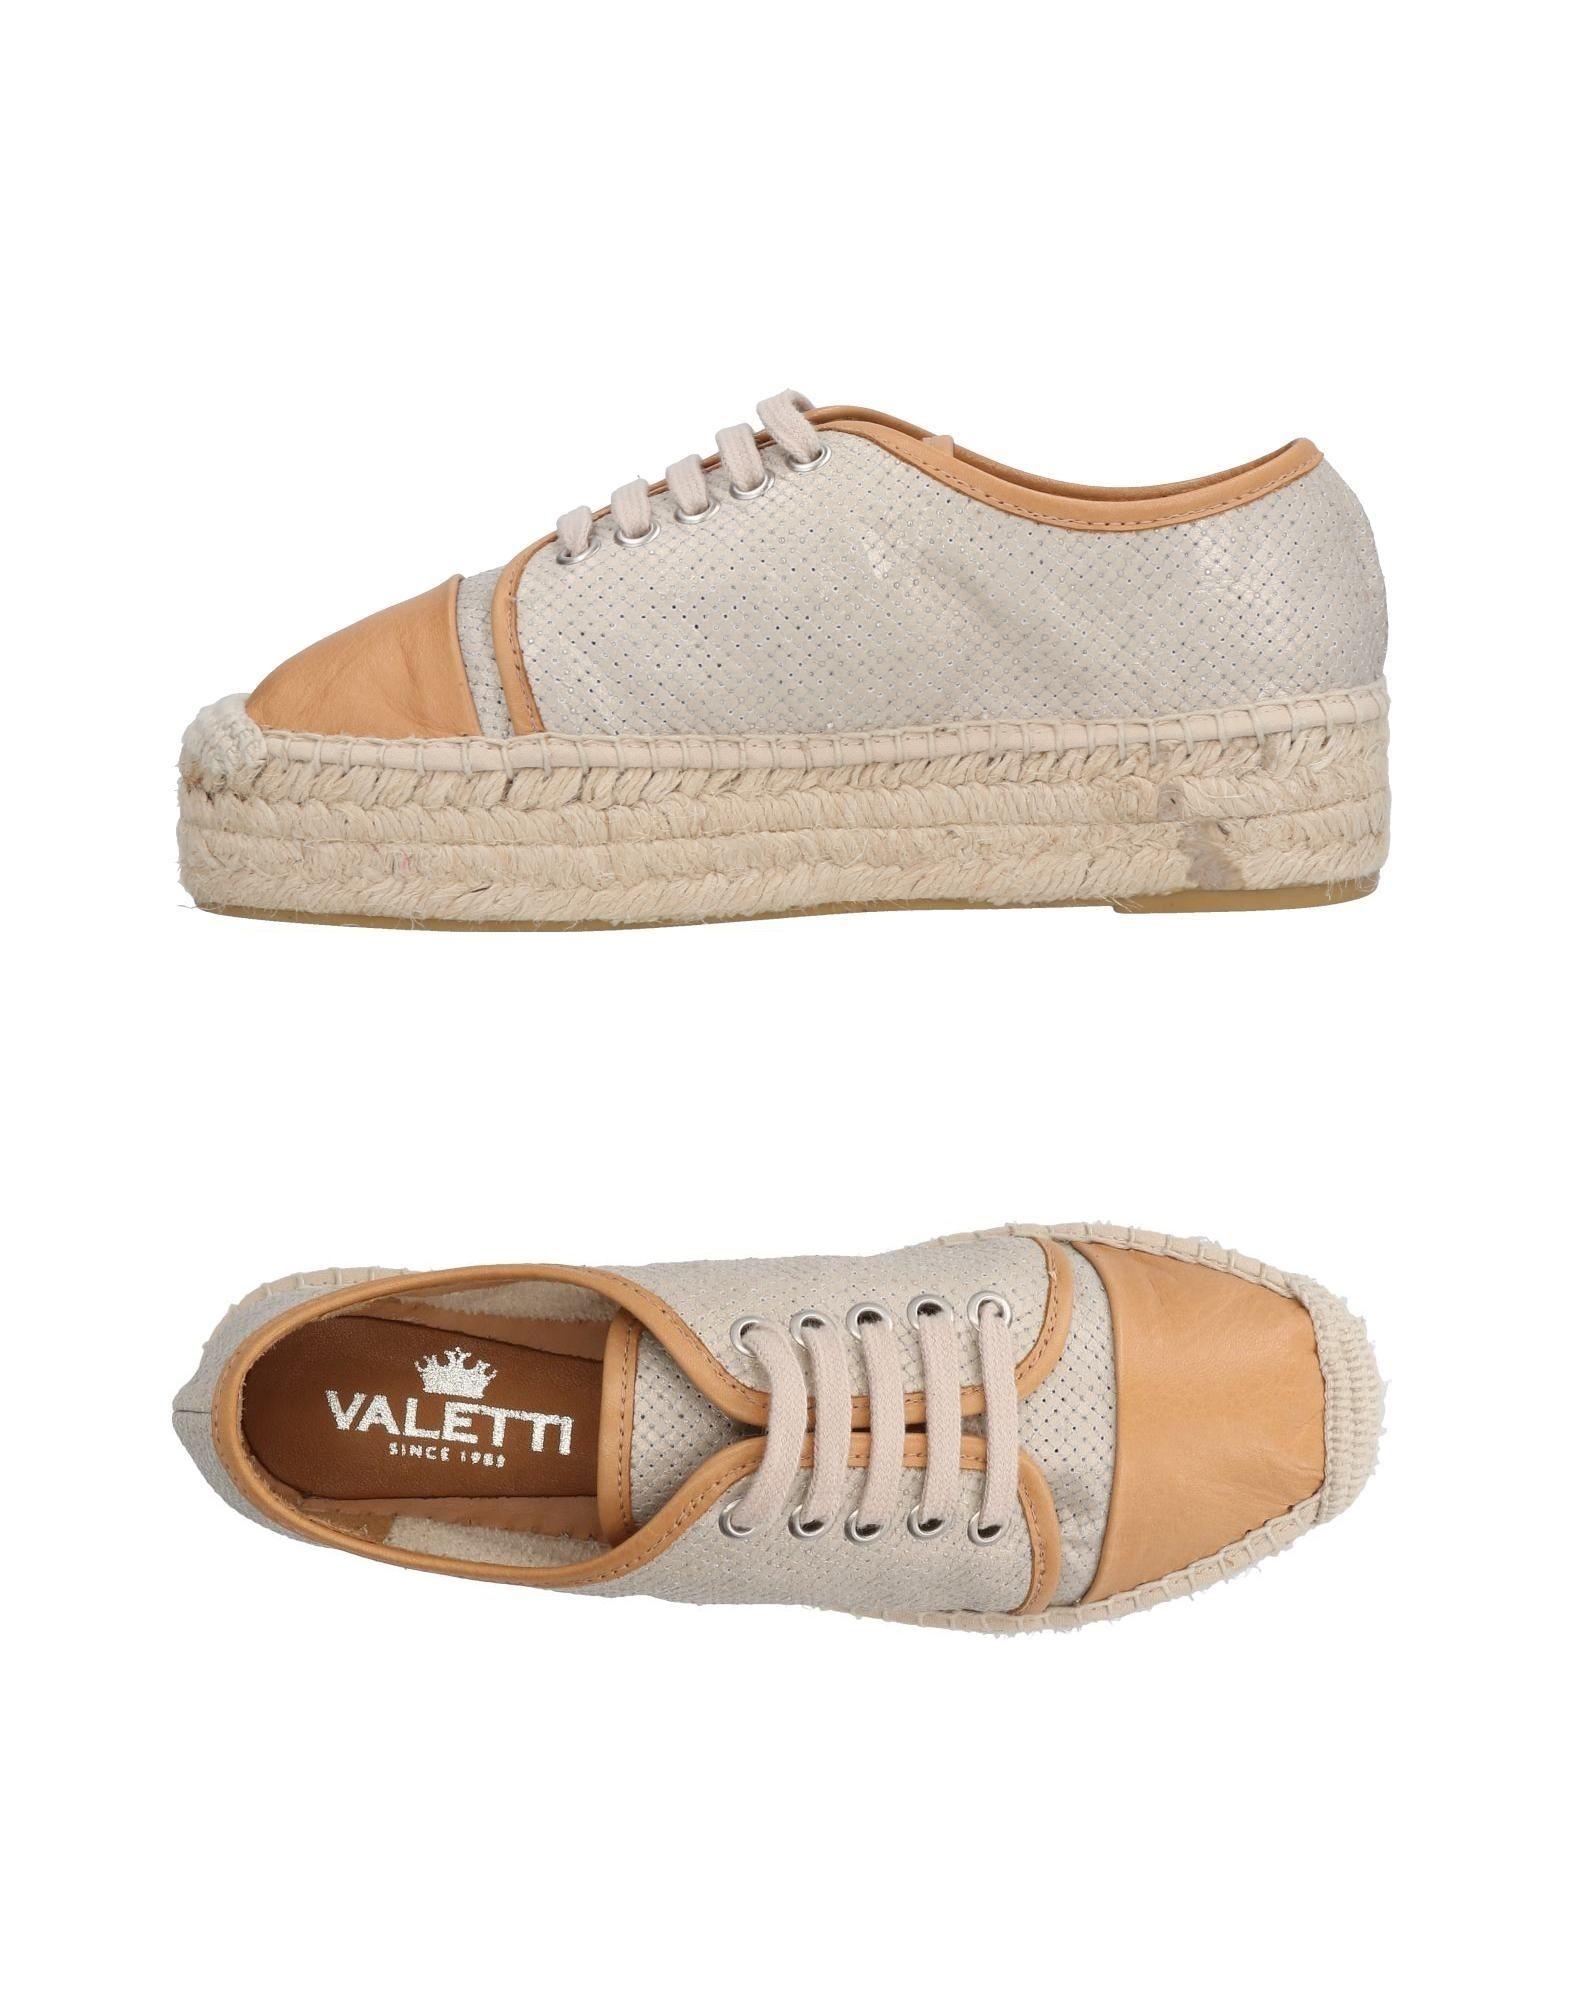 Moda Stringate Valetti Donna Donna Valetti - 11474009RI 1f354f